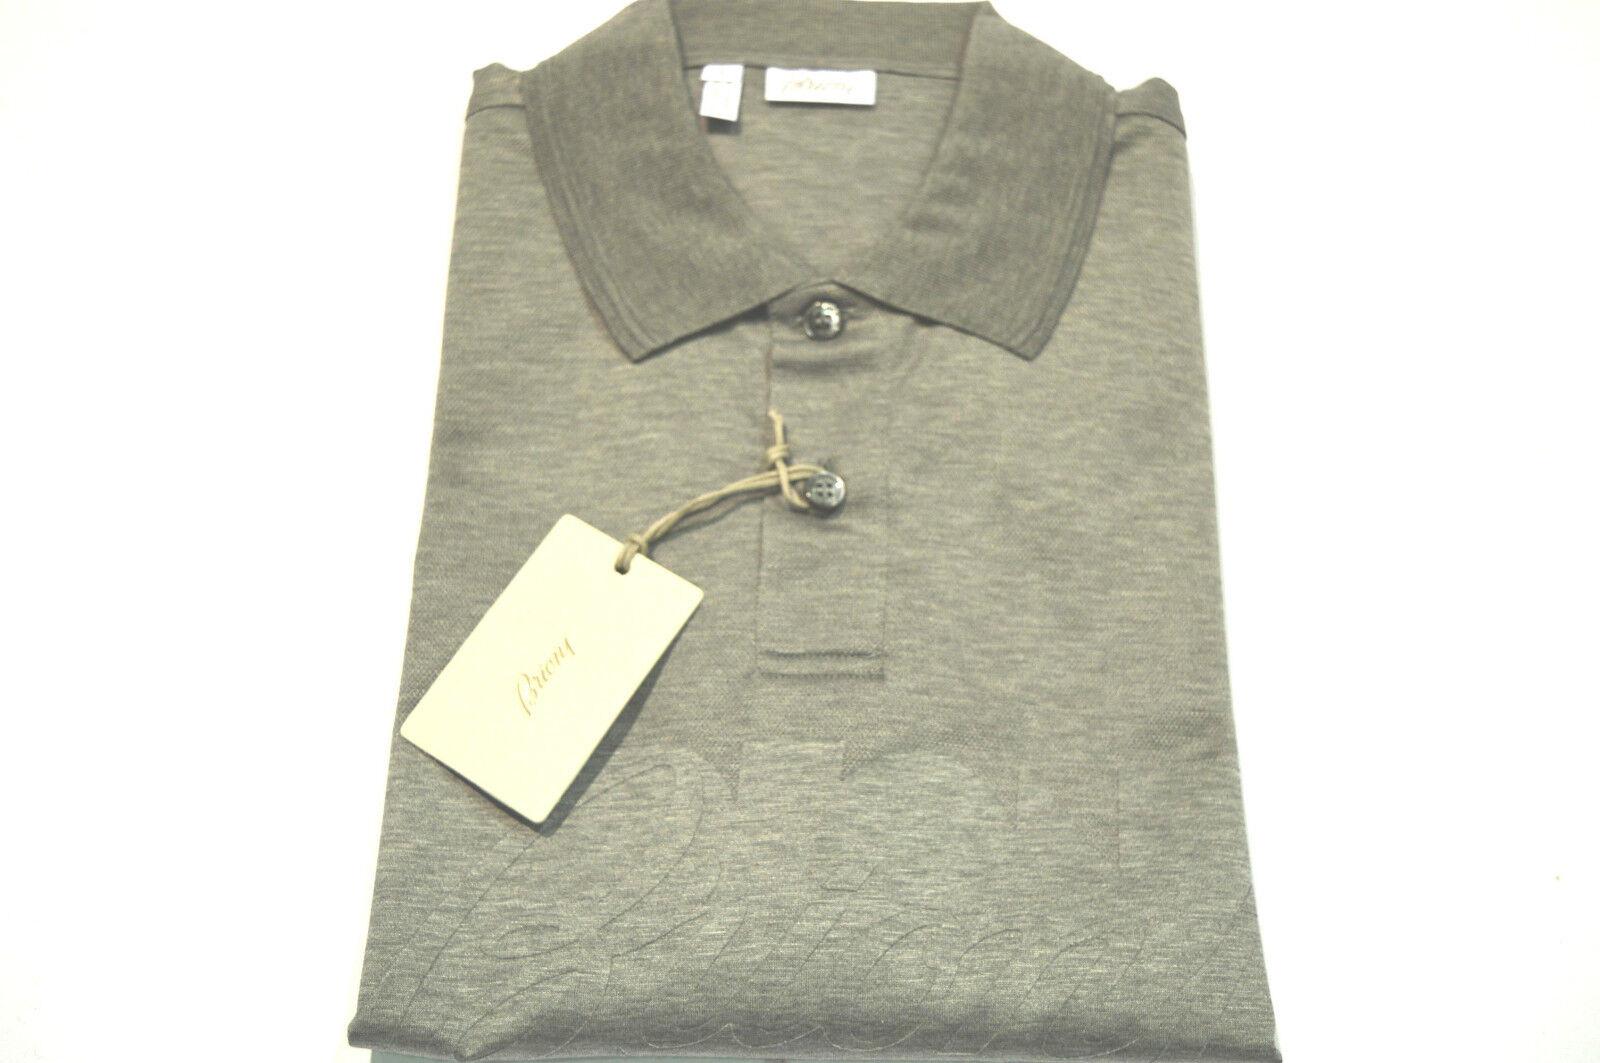 NEW  BRIONI Polo  Short Sleeve Cotton Größe XL Us Eu 54 (SpstampB)